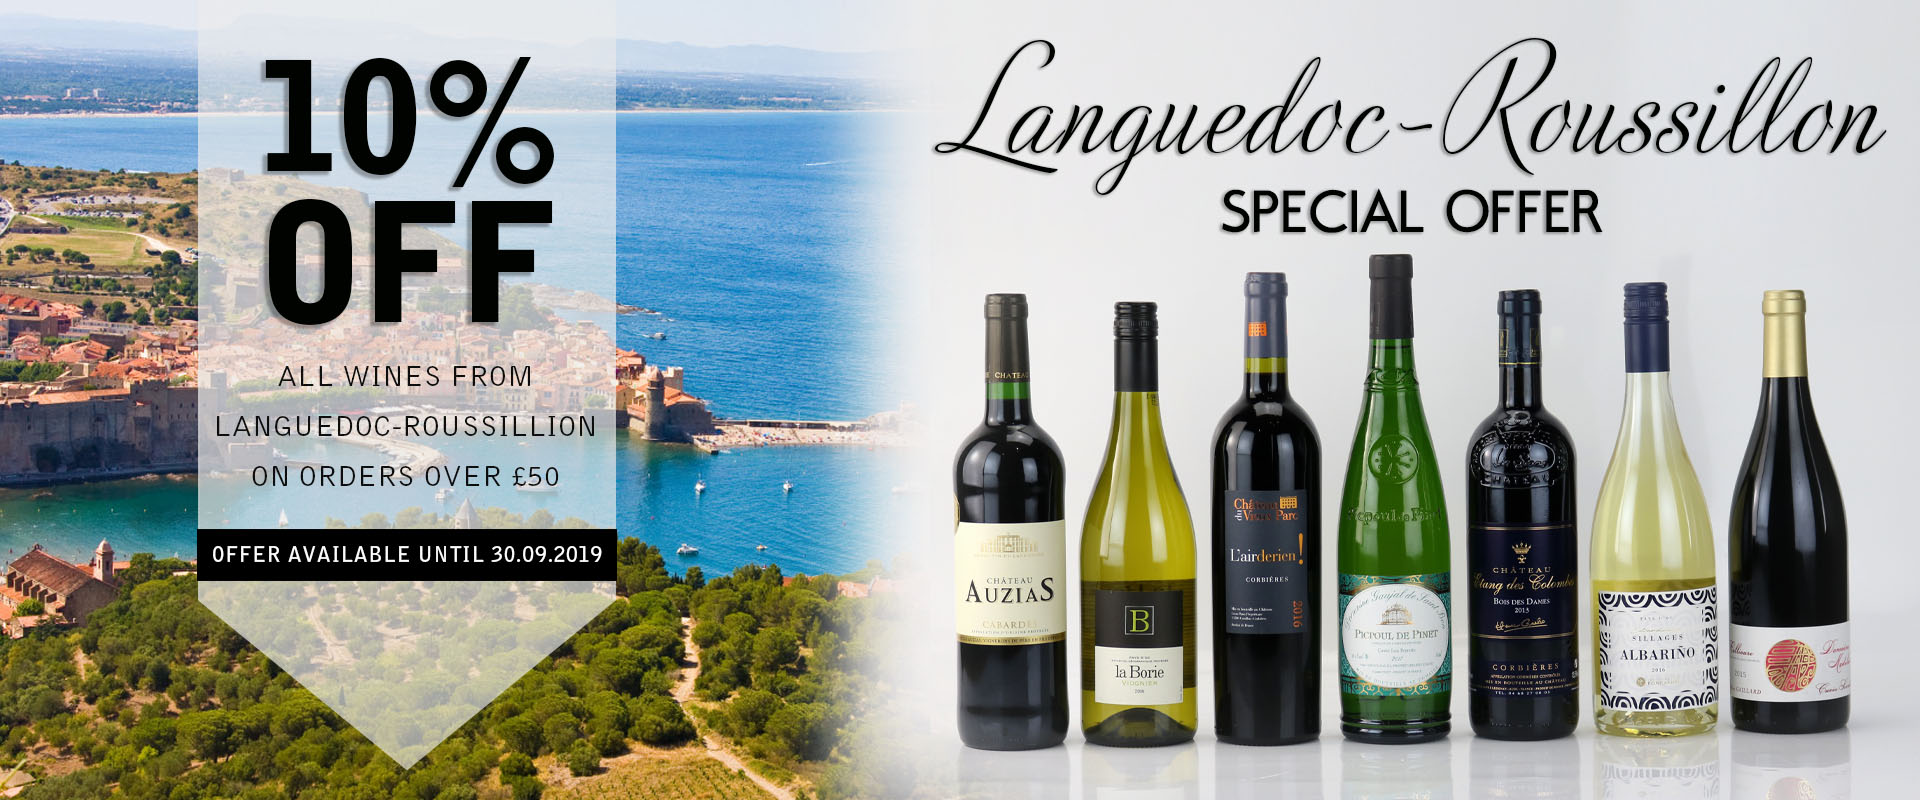 Languedoc 10% Offer